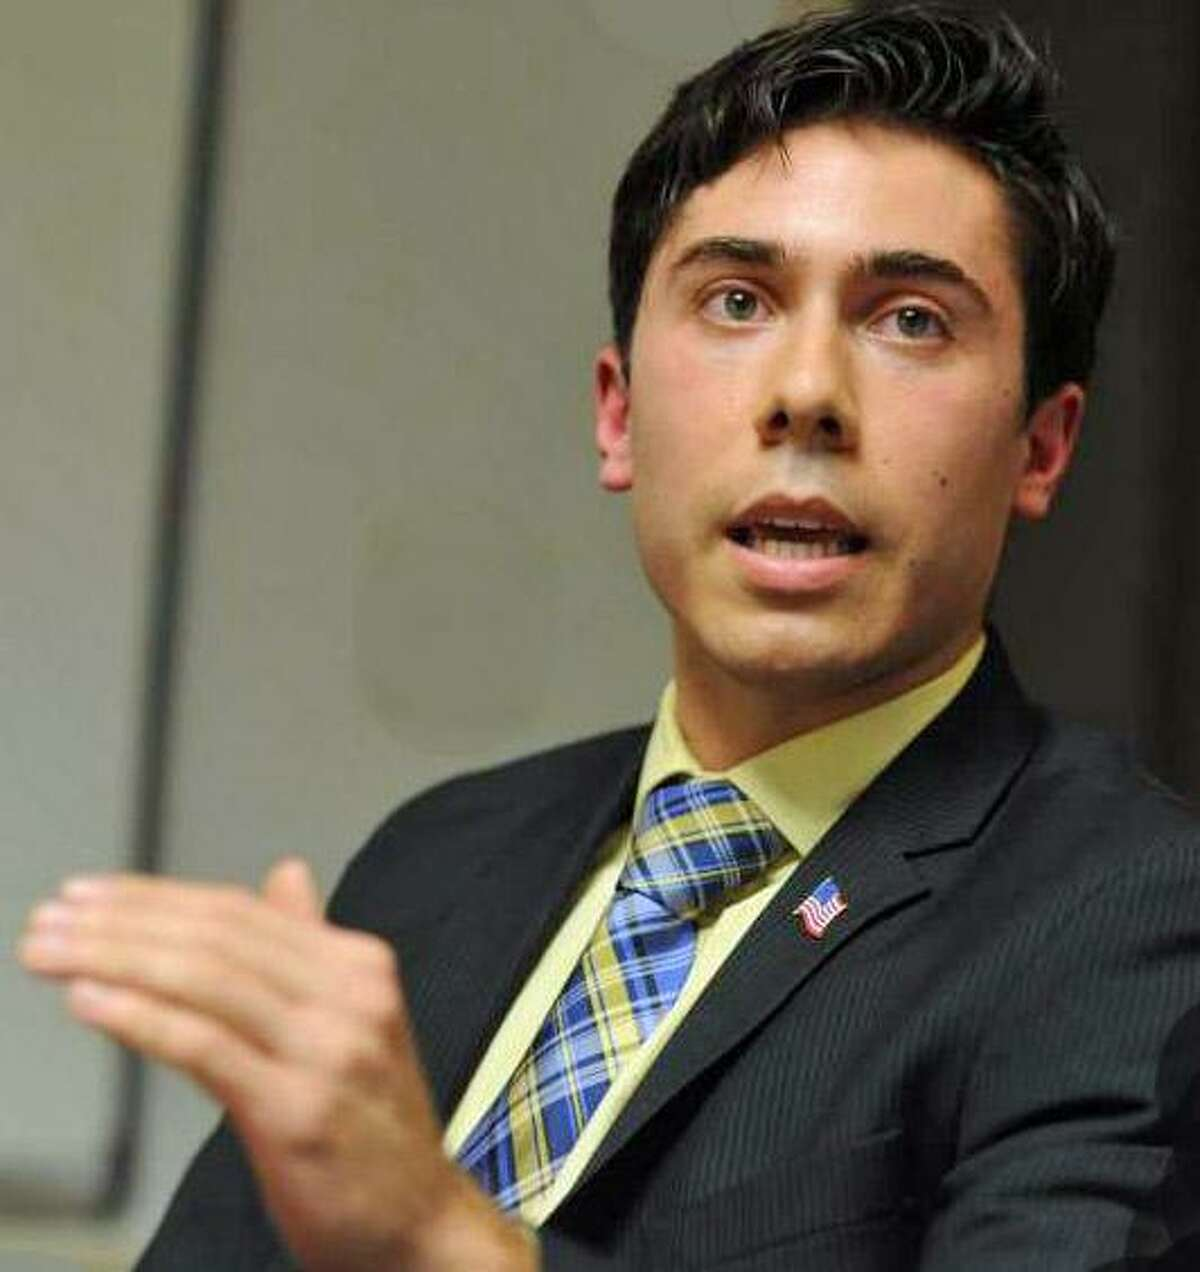 State Rep. David Arconti